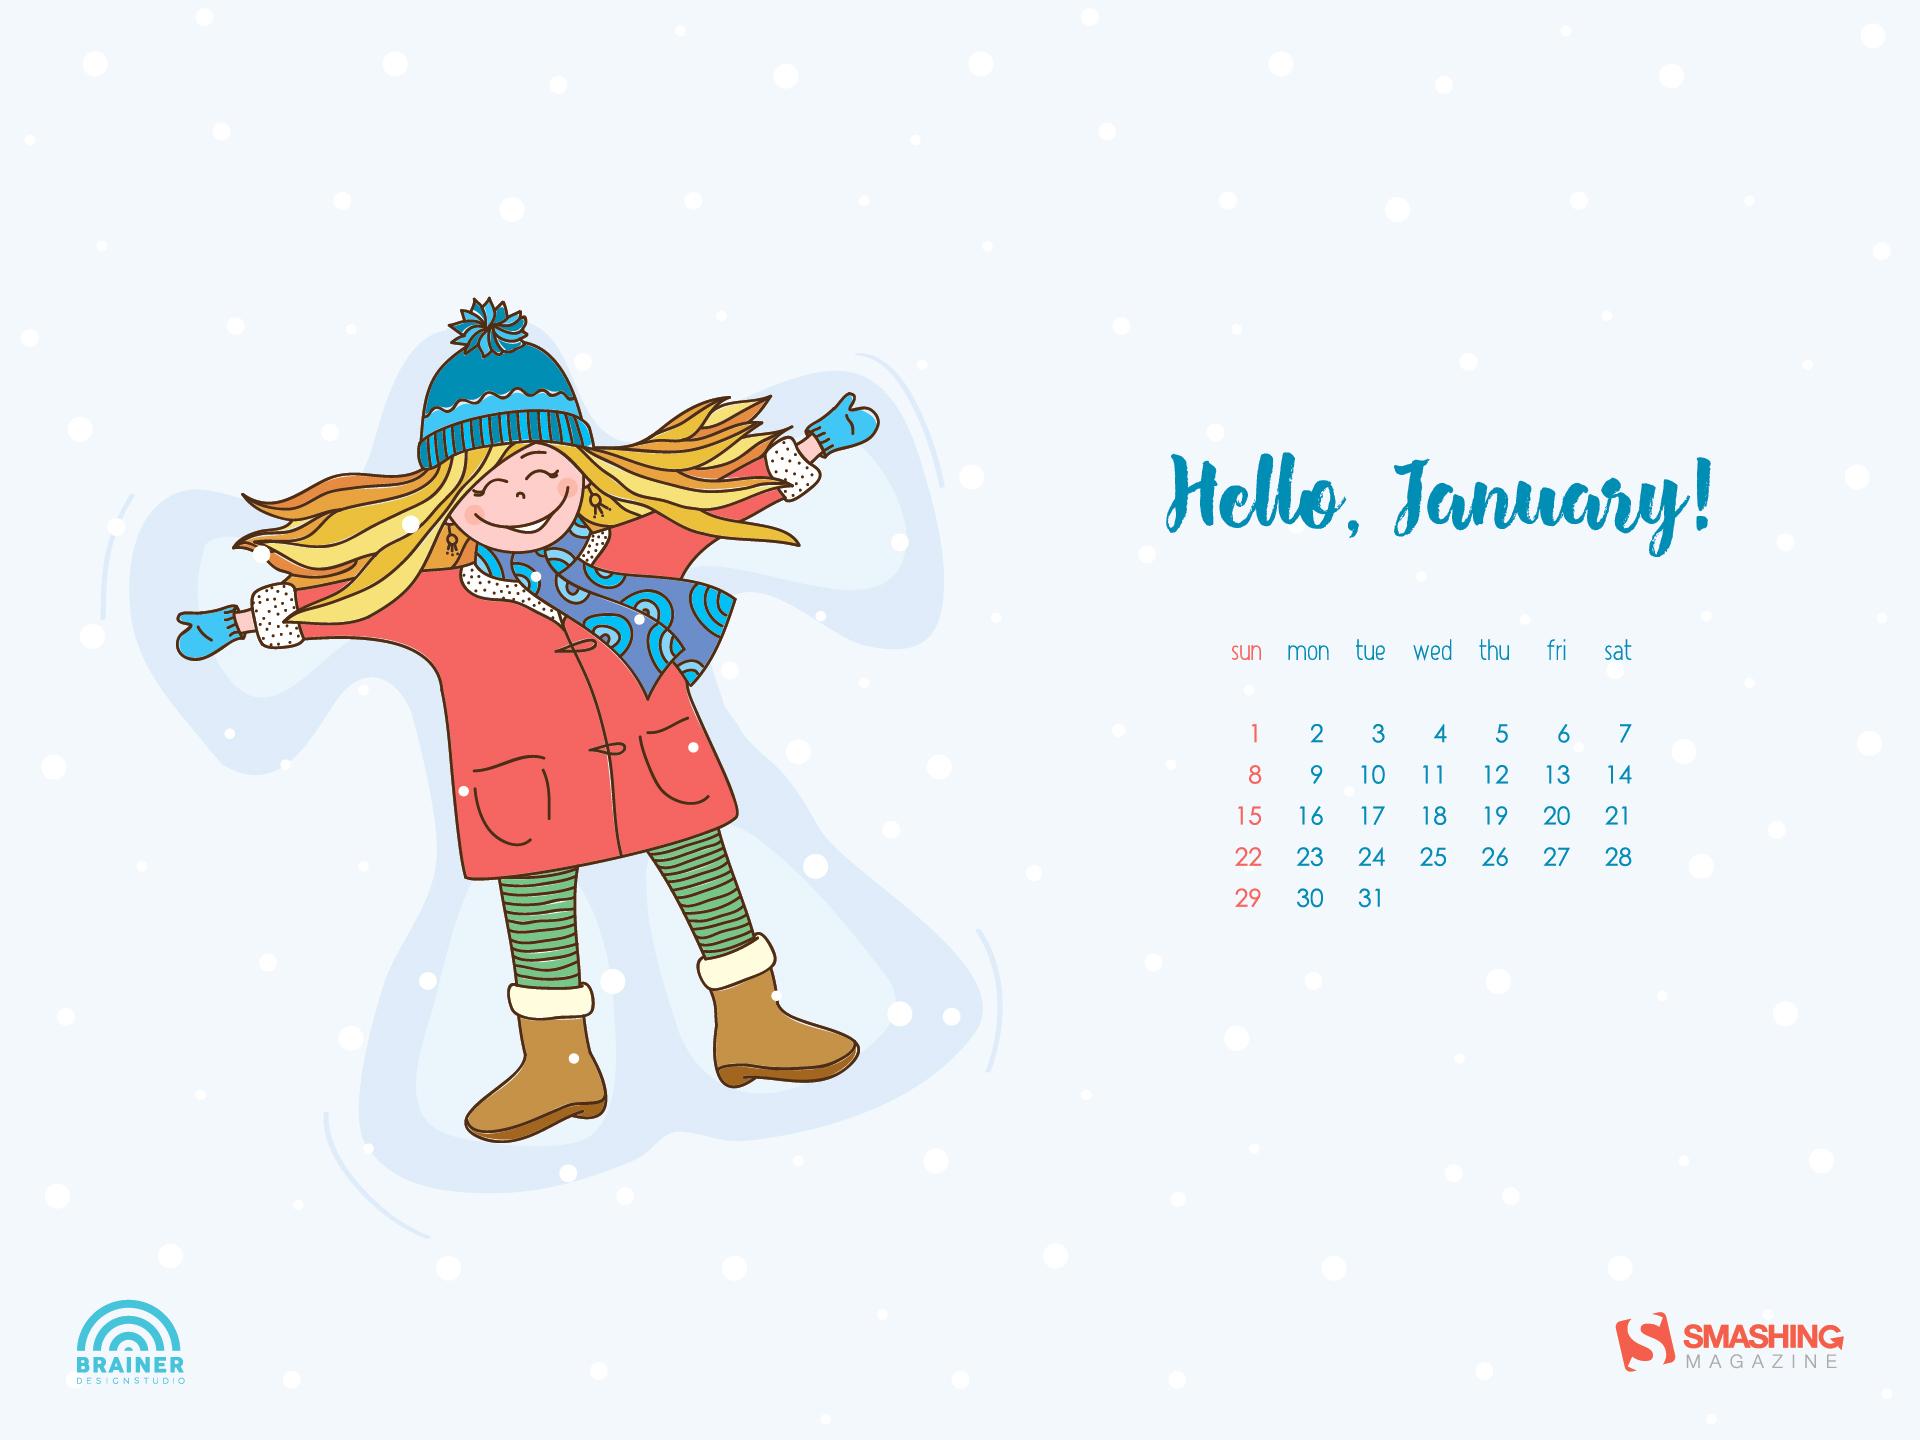 Desktop Wallpaper Calendars: January 2017 — Smashing Magazine with regard to Smashing Magazine Calendar